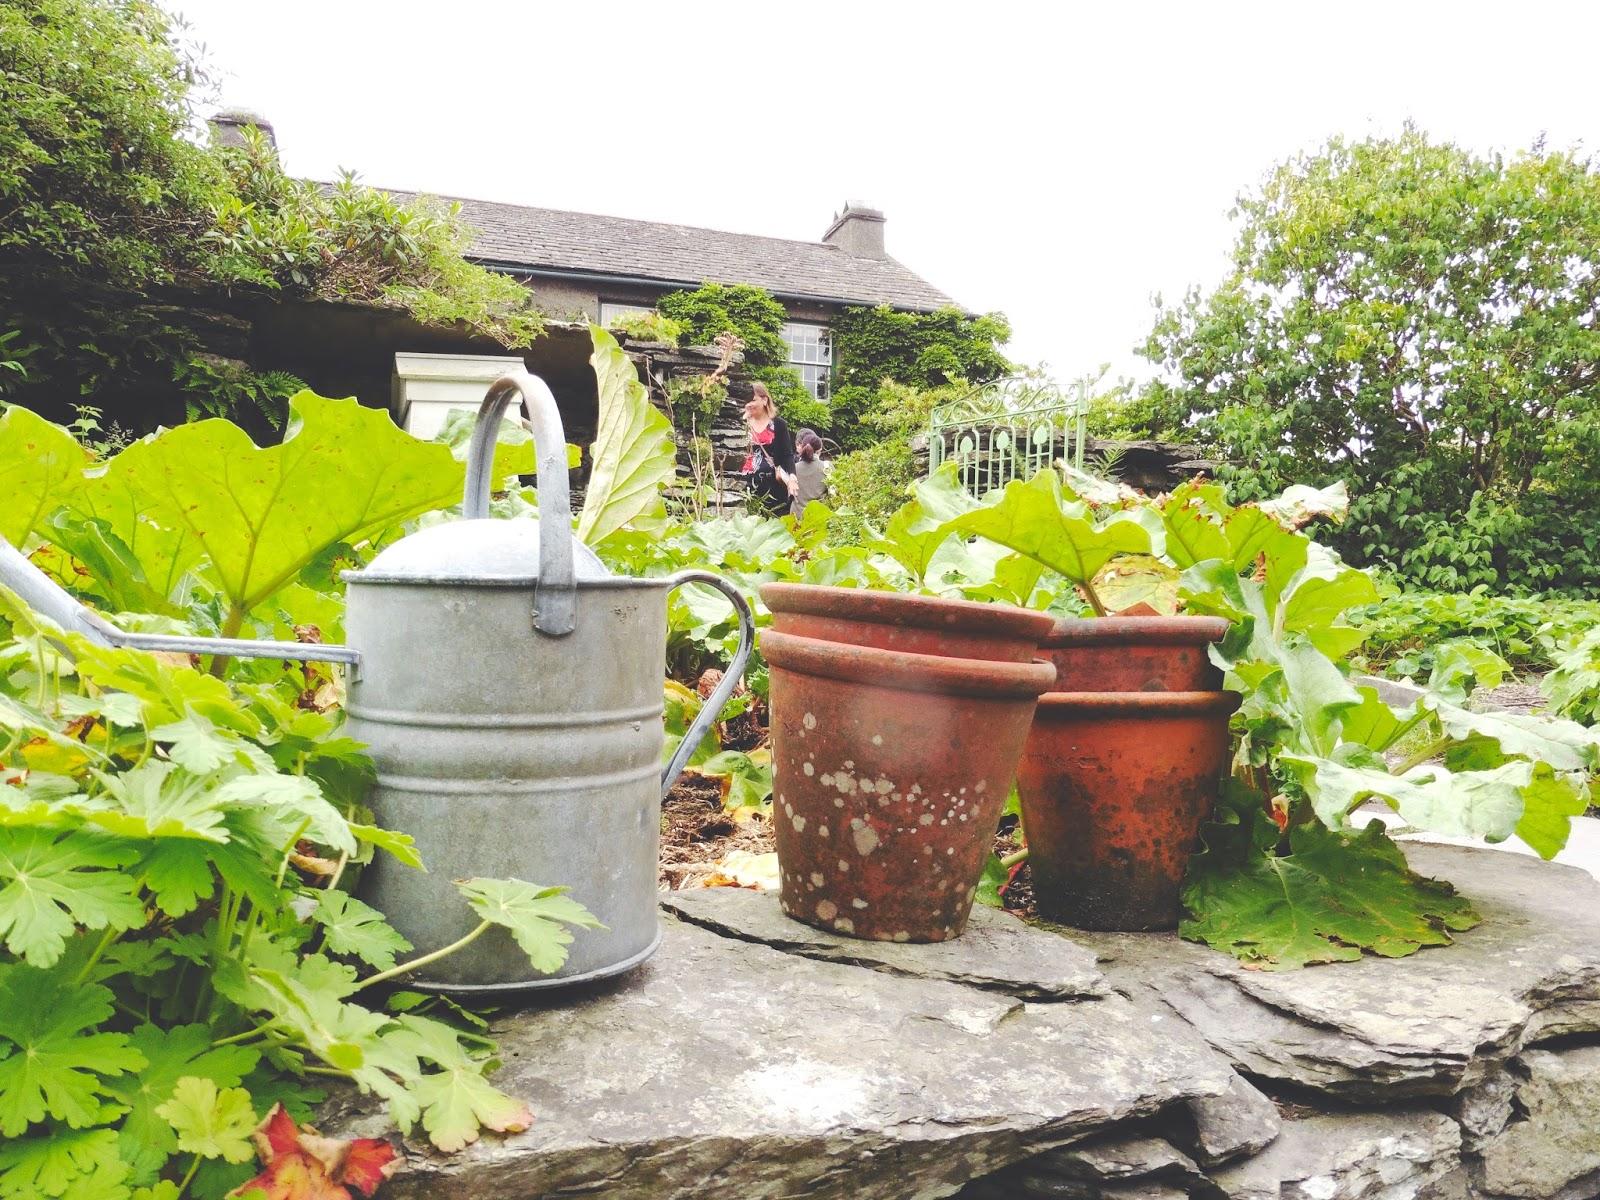 lebellelavie - Hill Top - The Beatrix Potter House